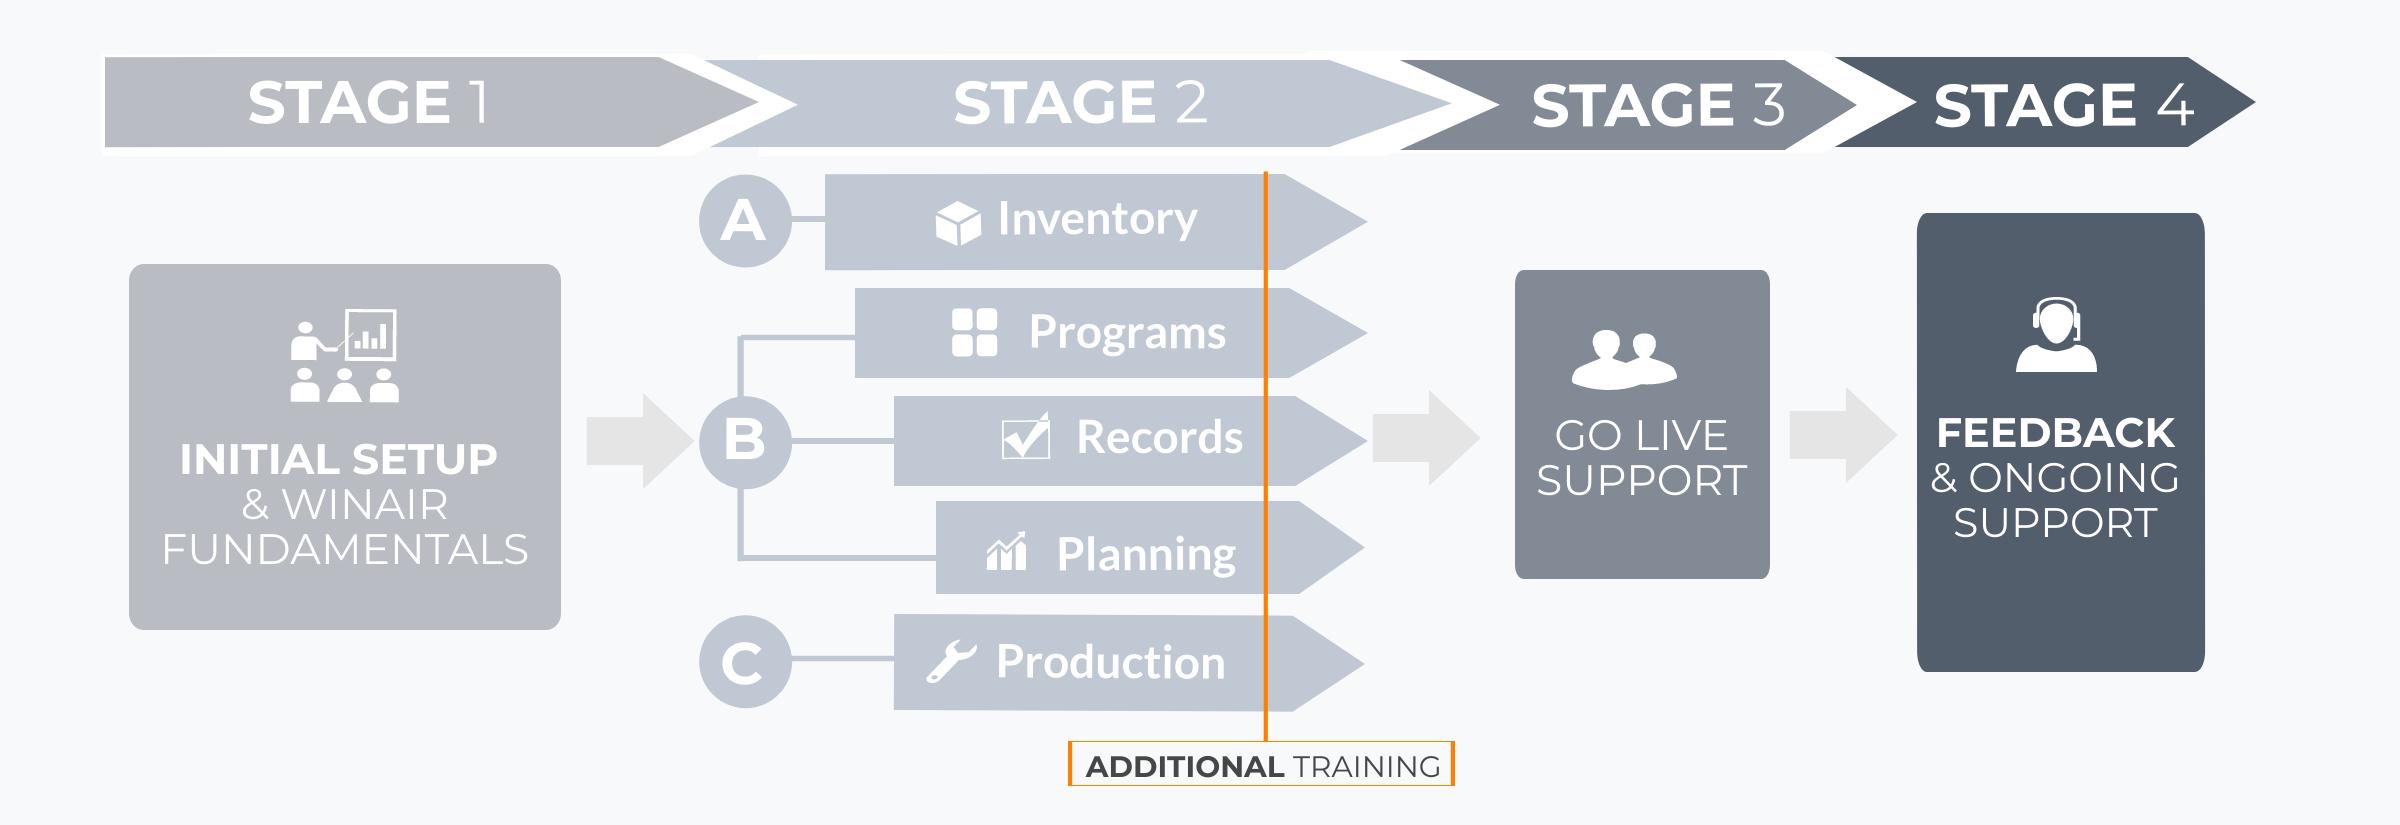 WinAir - Staged Implementation Workflow Diagram - Aviation Management Software